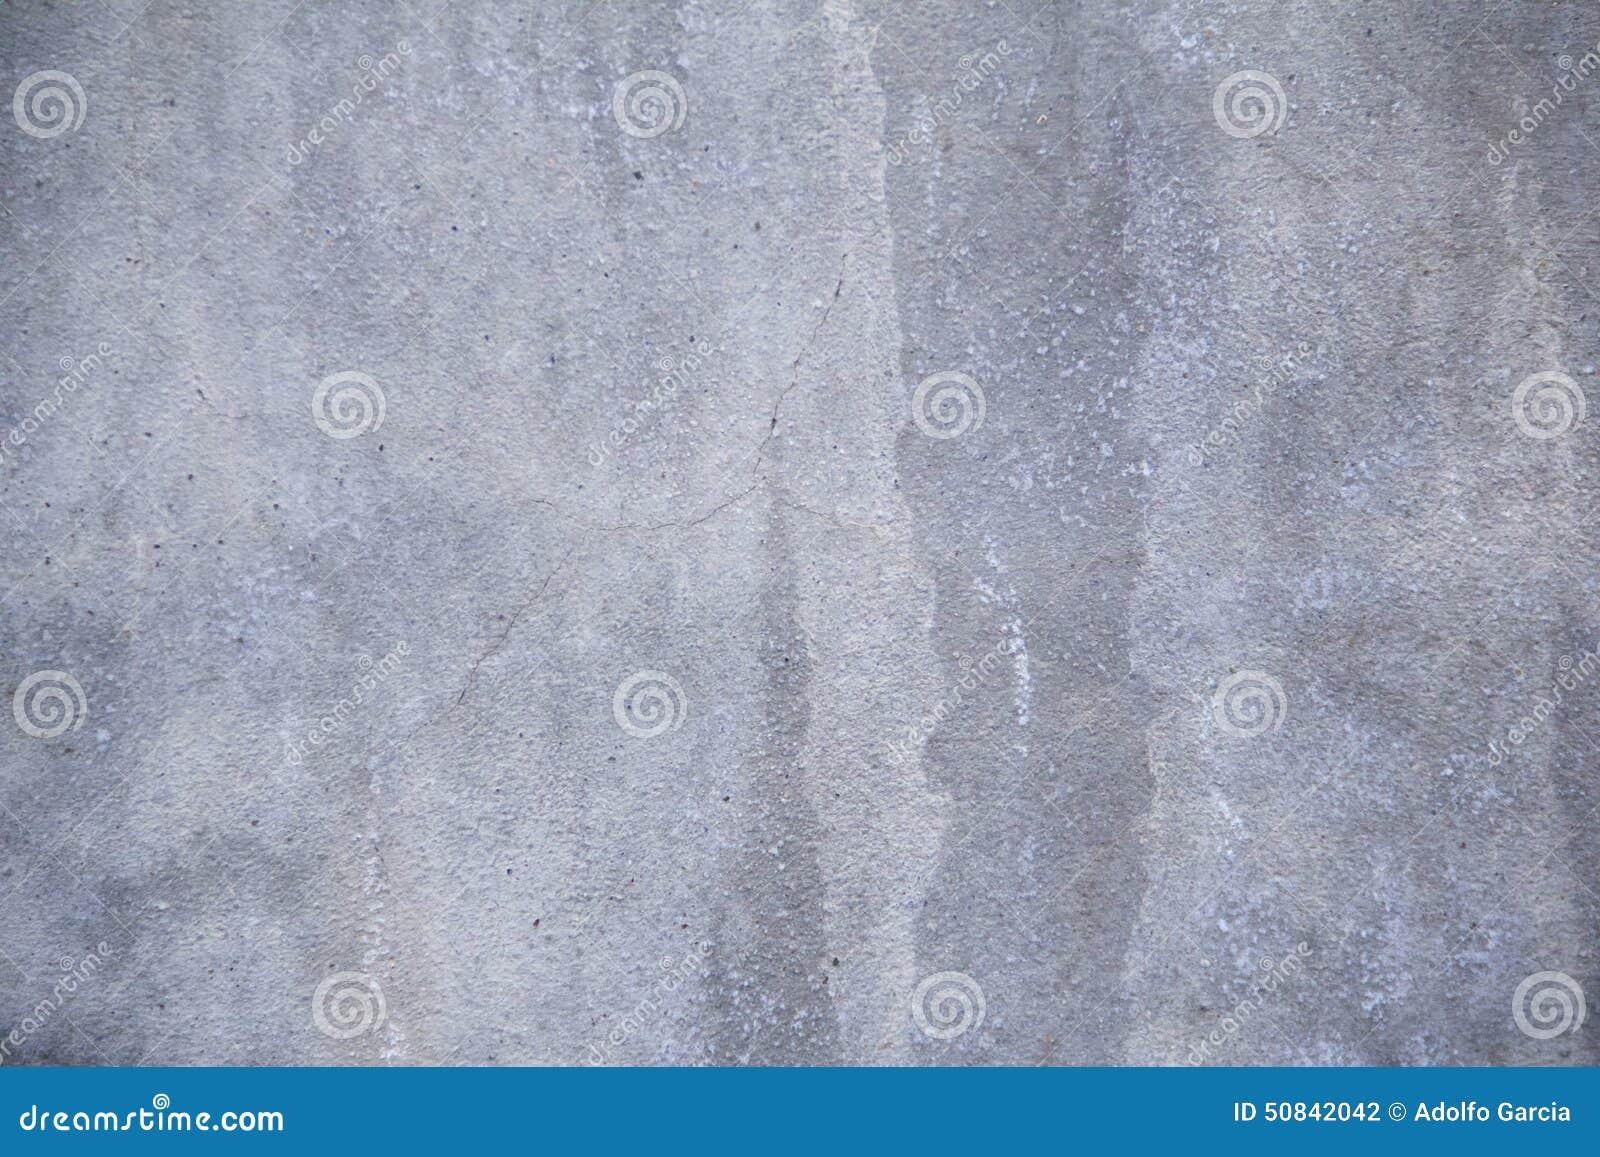 Rough grey background